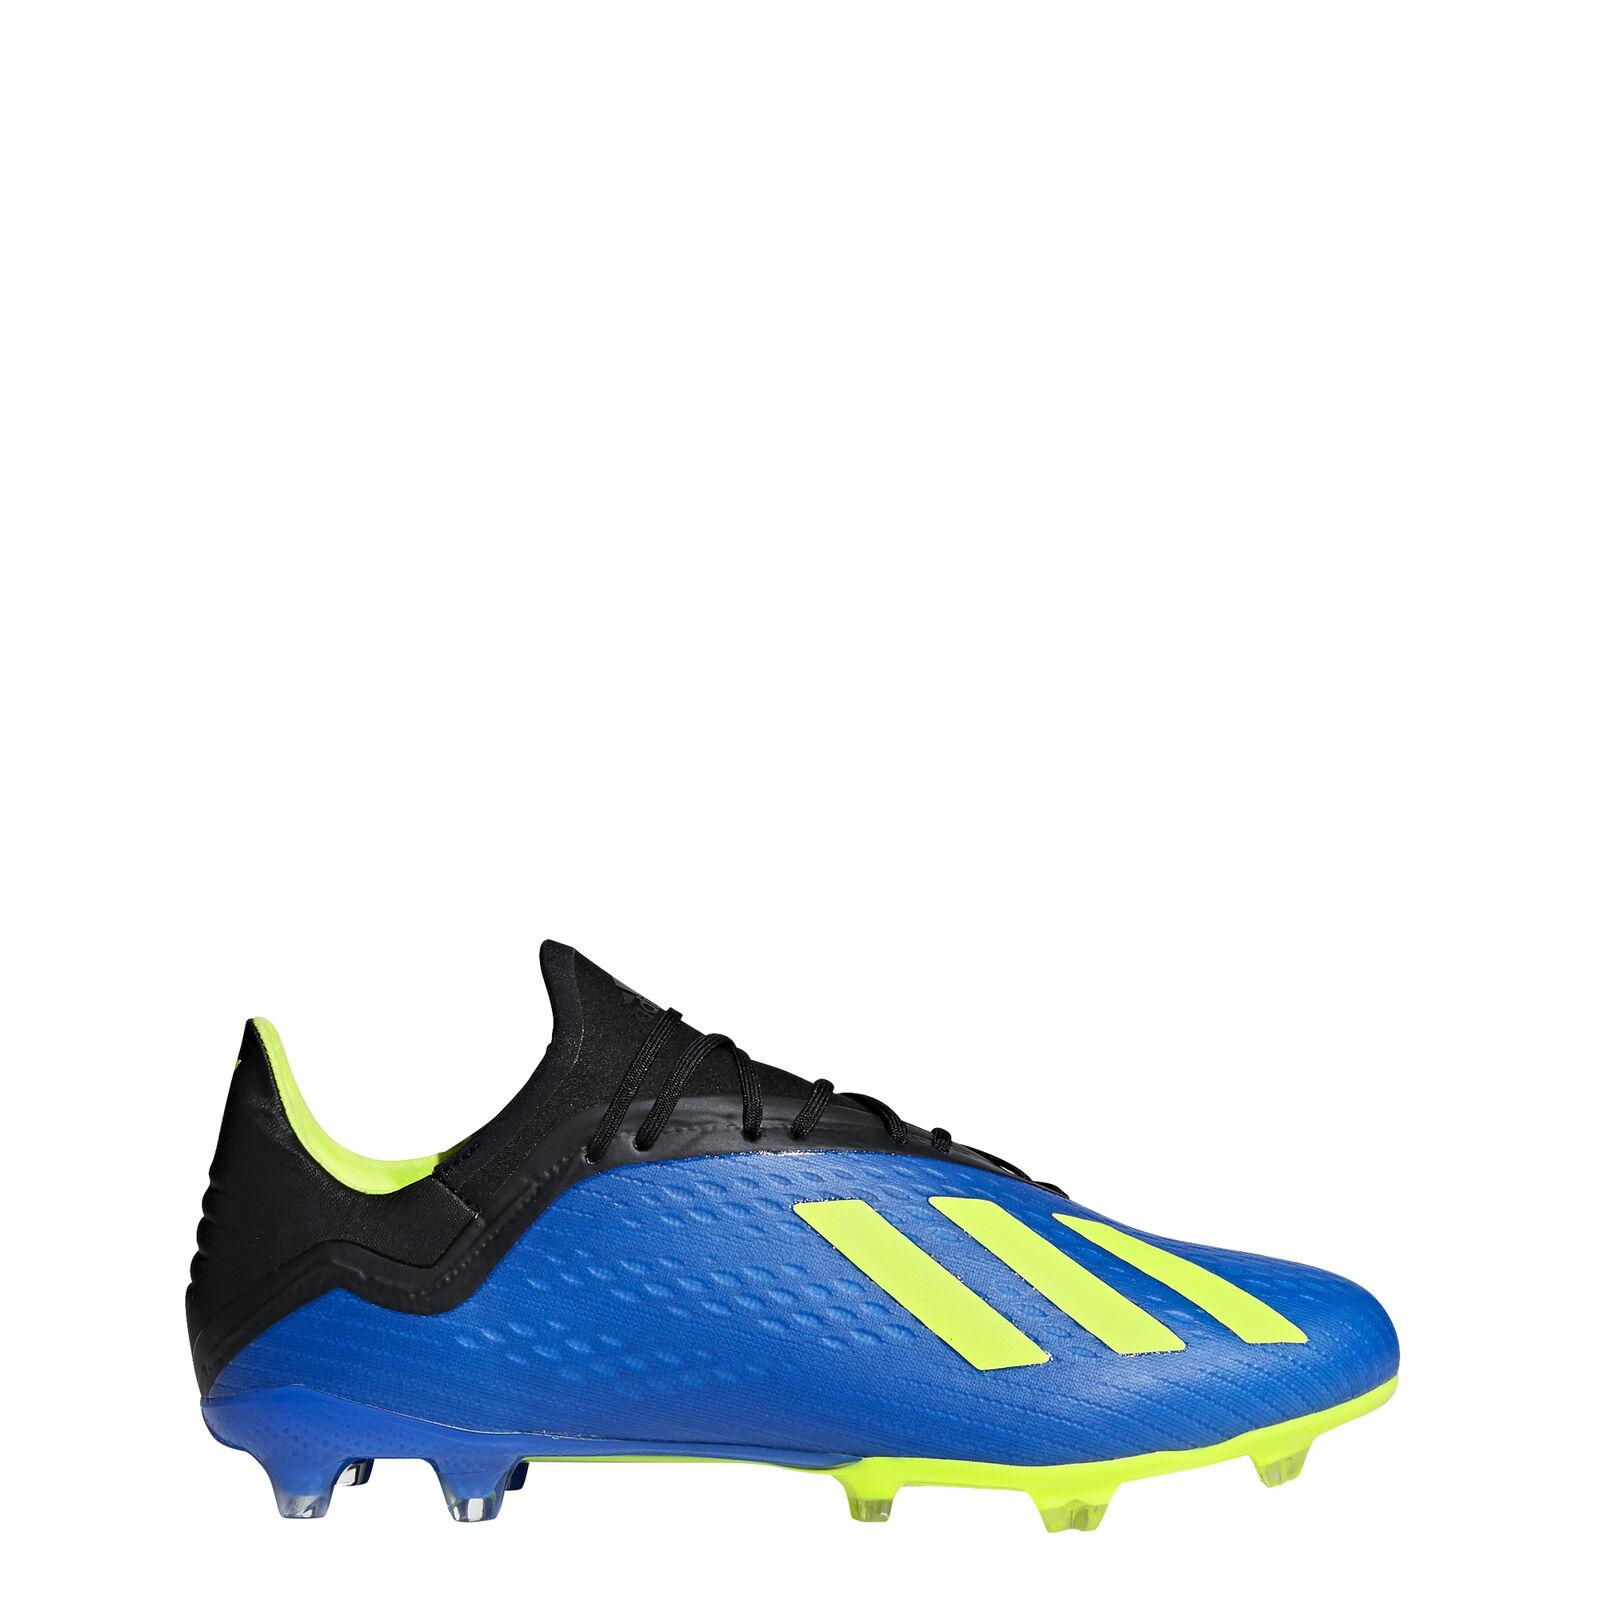 Adidas Adidas Adidas Fußballschuhe X 18.2 FG Nockenschuhe Fußball Outdoor 9285ad